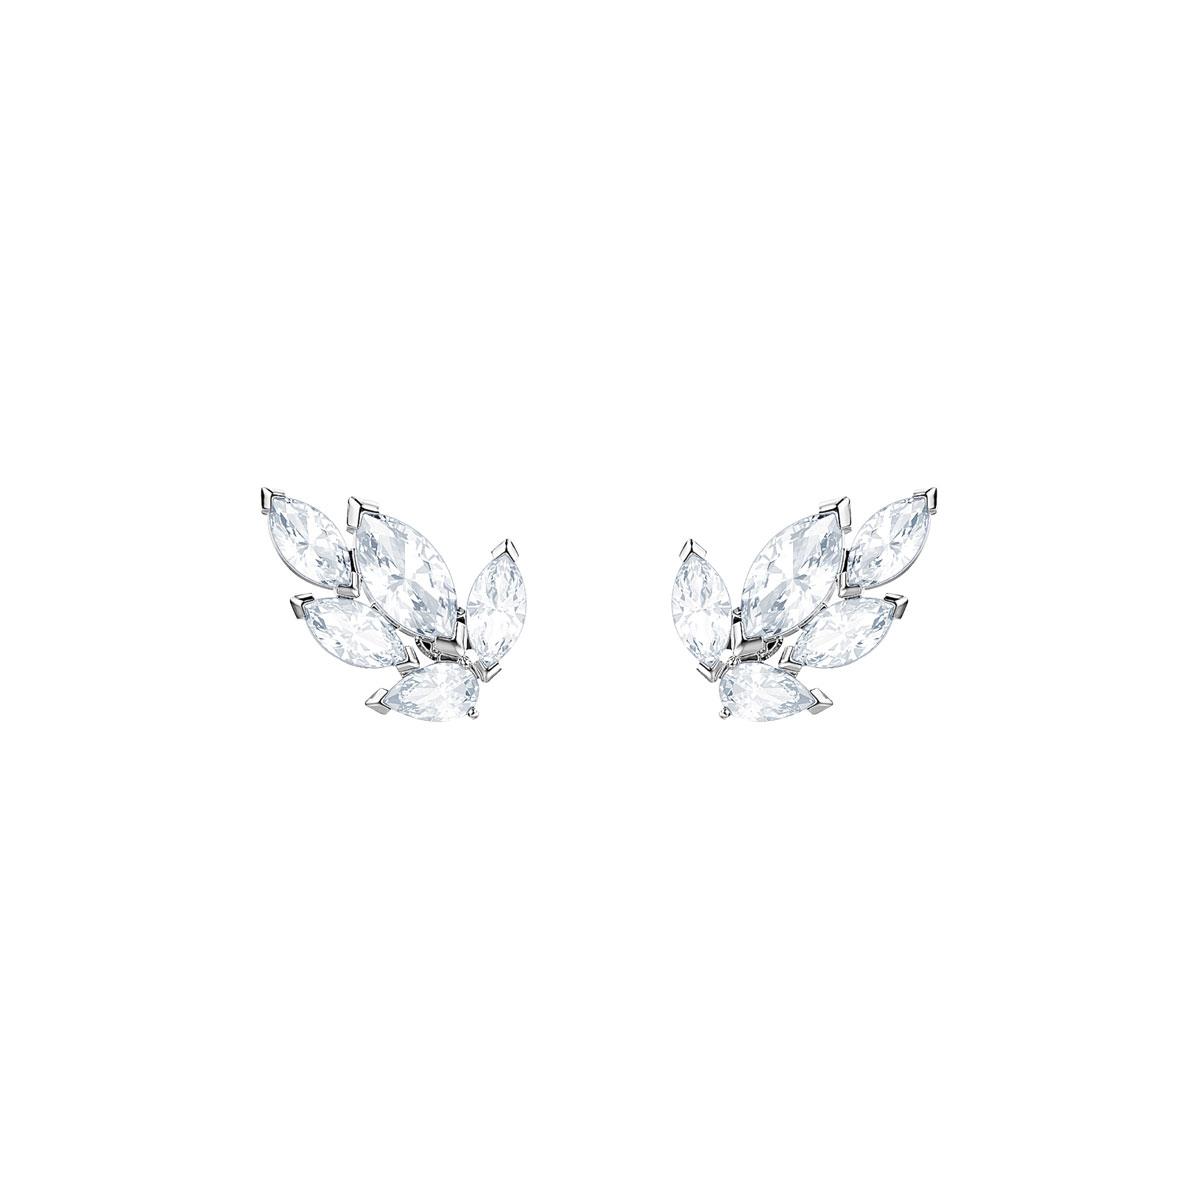 Swarovski Louison Stud Pierced Earrings, White, Rhodium